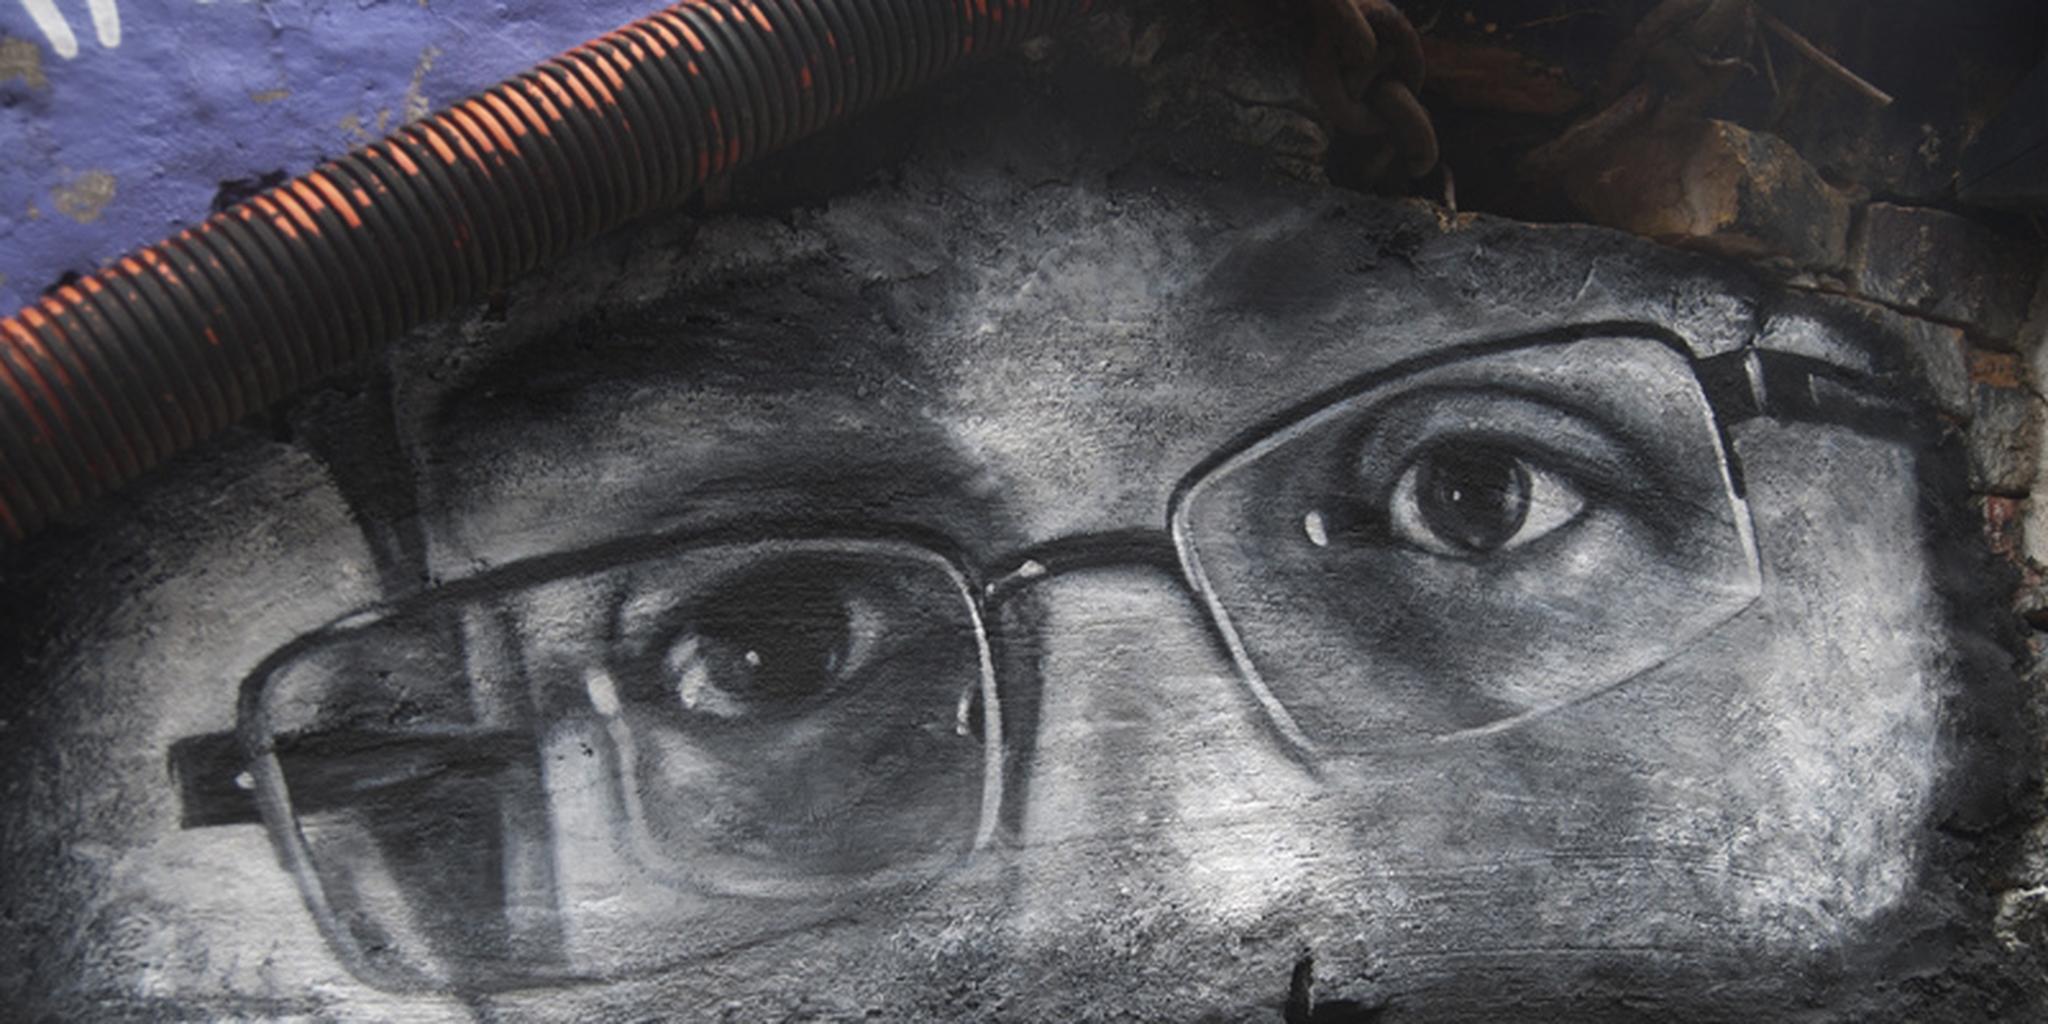 Edward Snowden eyes DDC_8315 | Flickr - Photo Sharing!